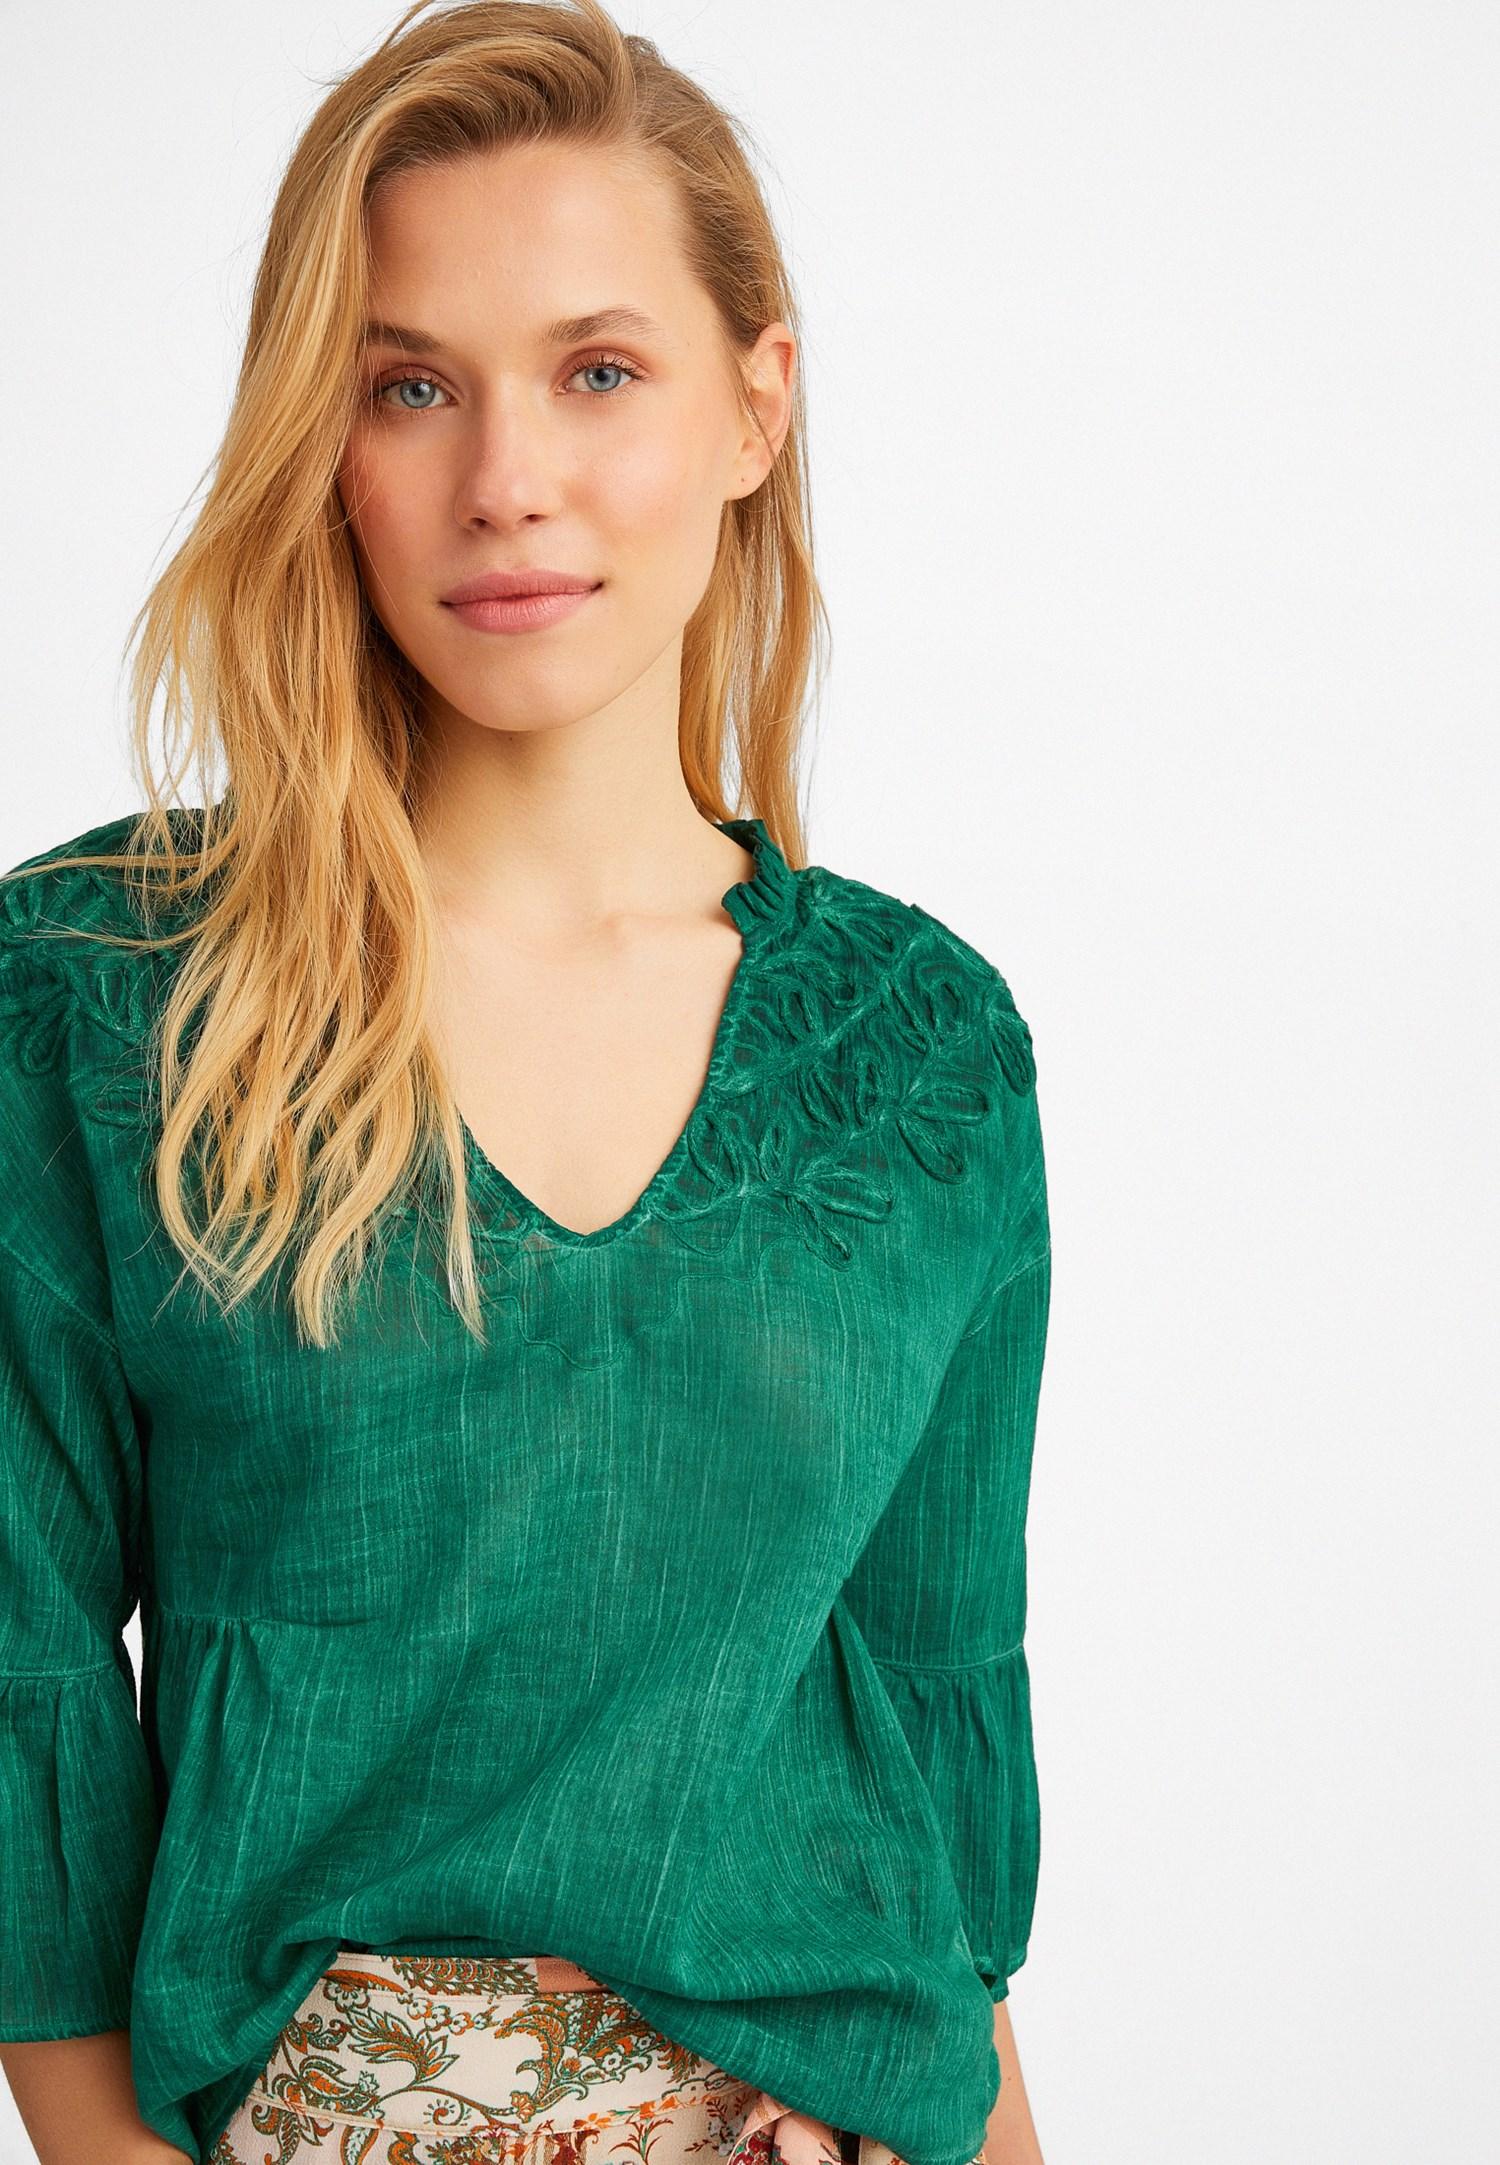 Bayan Yeşil Nakış Detaylı Yıkamalı Bluz